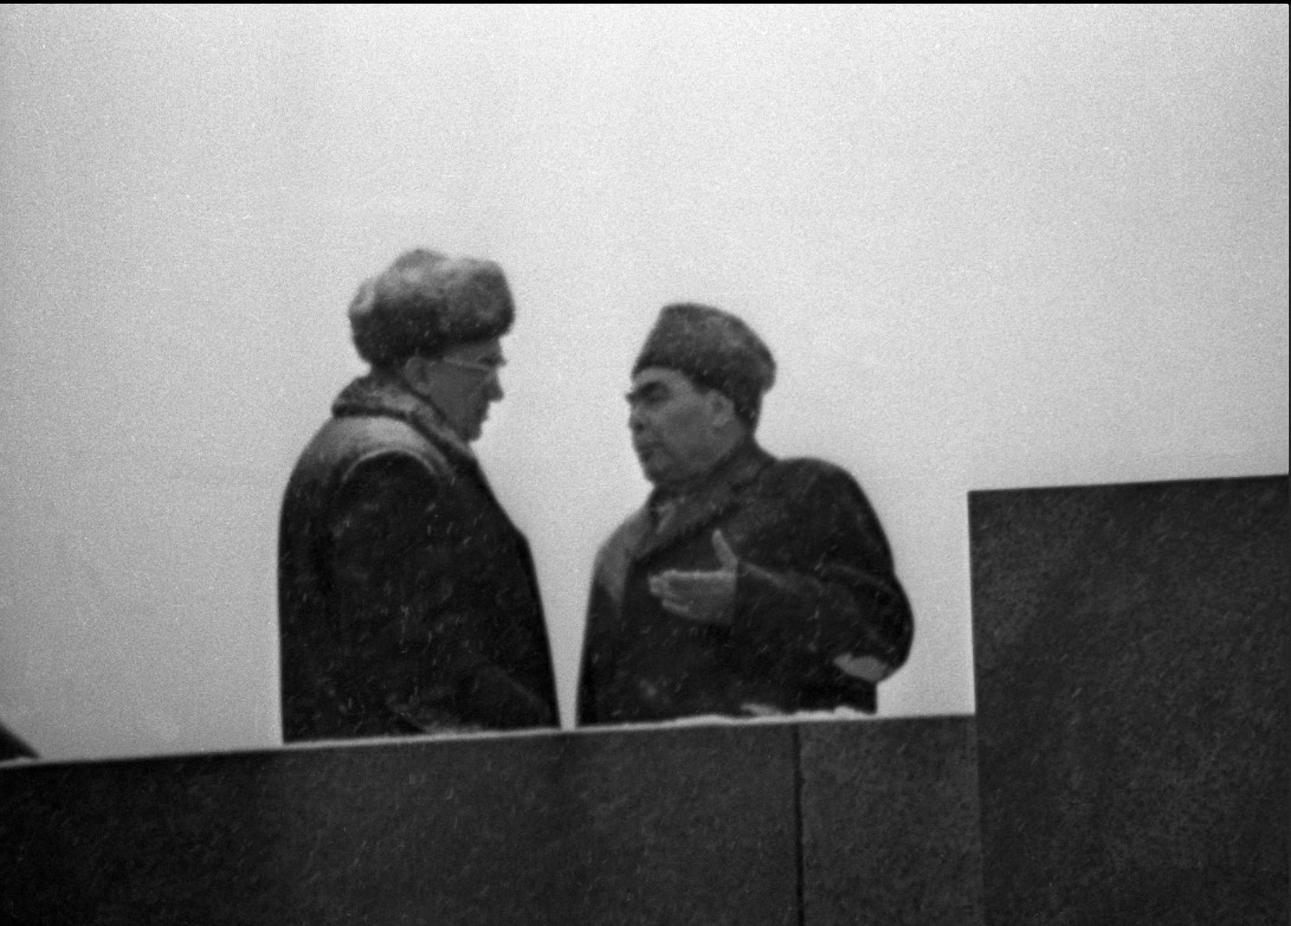 1970-е. Леонид Брежнев и Юрий Андропов